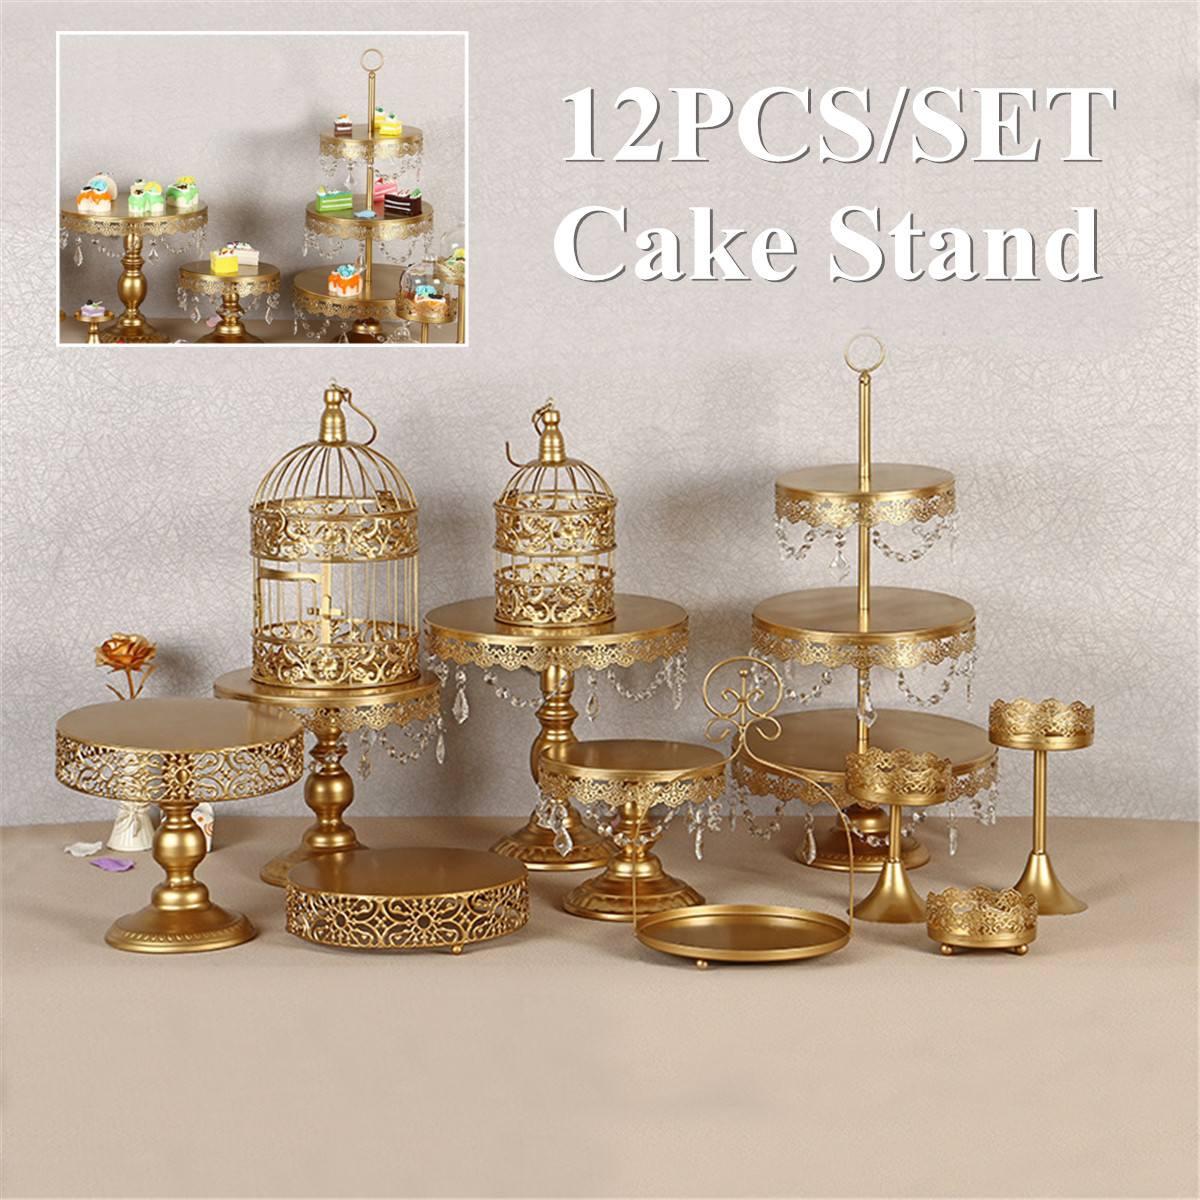 Vintage Crystal Cake Holder Cupcake Stand Wedding Dessert Vegetable Display Storage Rack Birthday Party Decorations 12Pcs Set